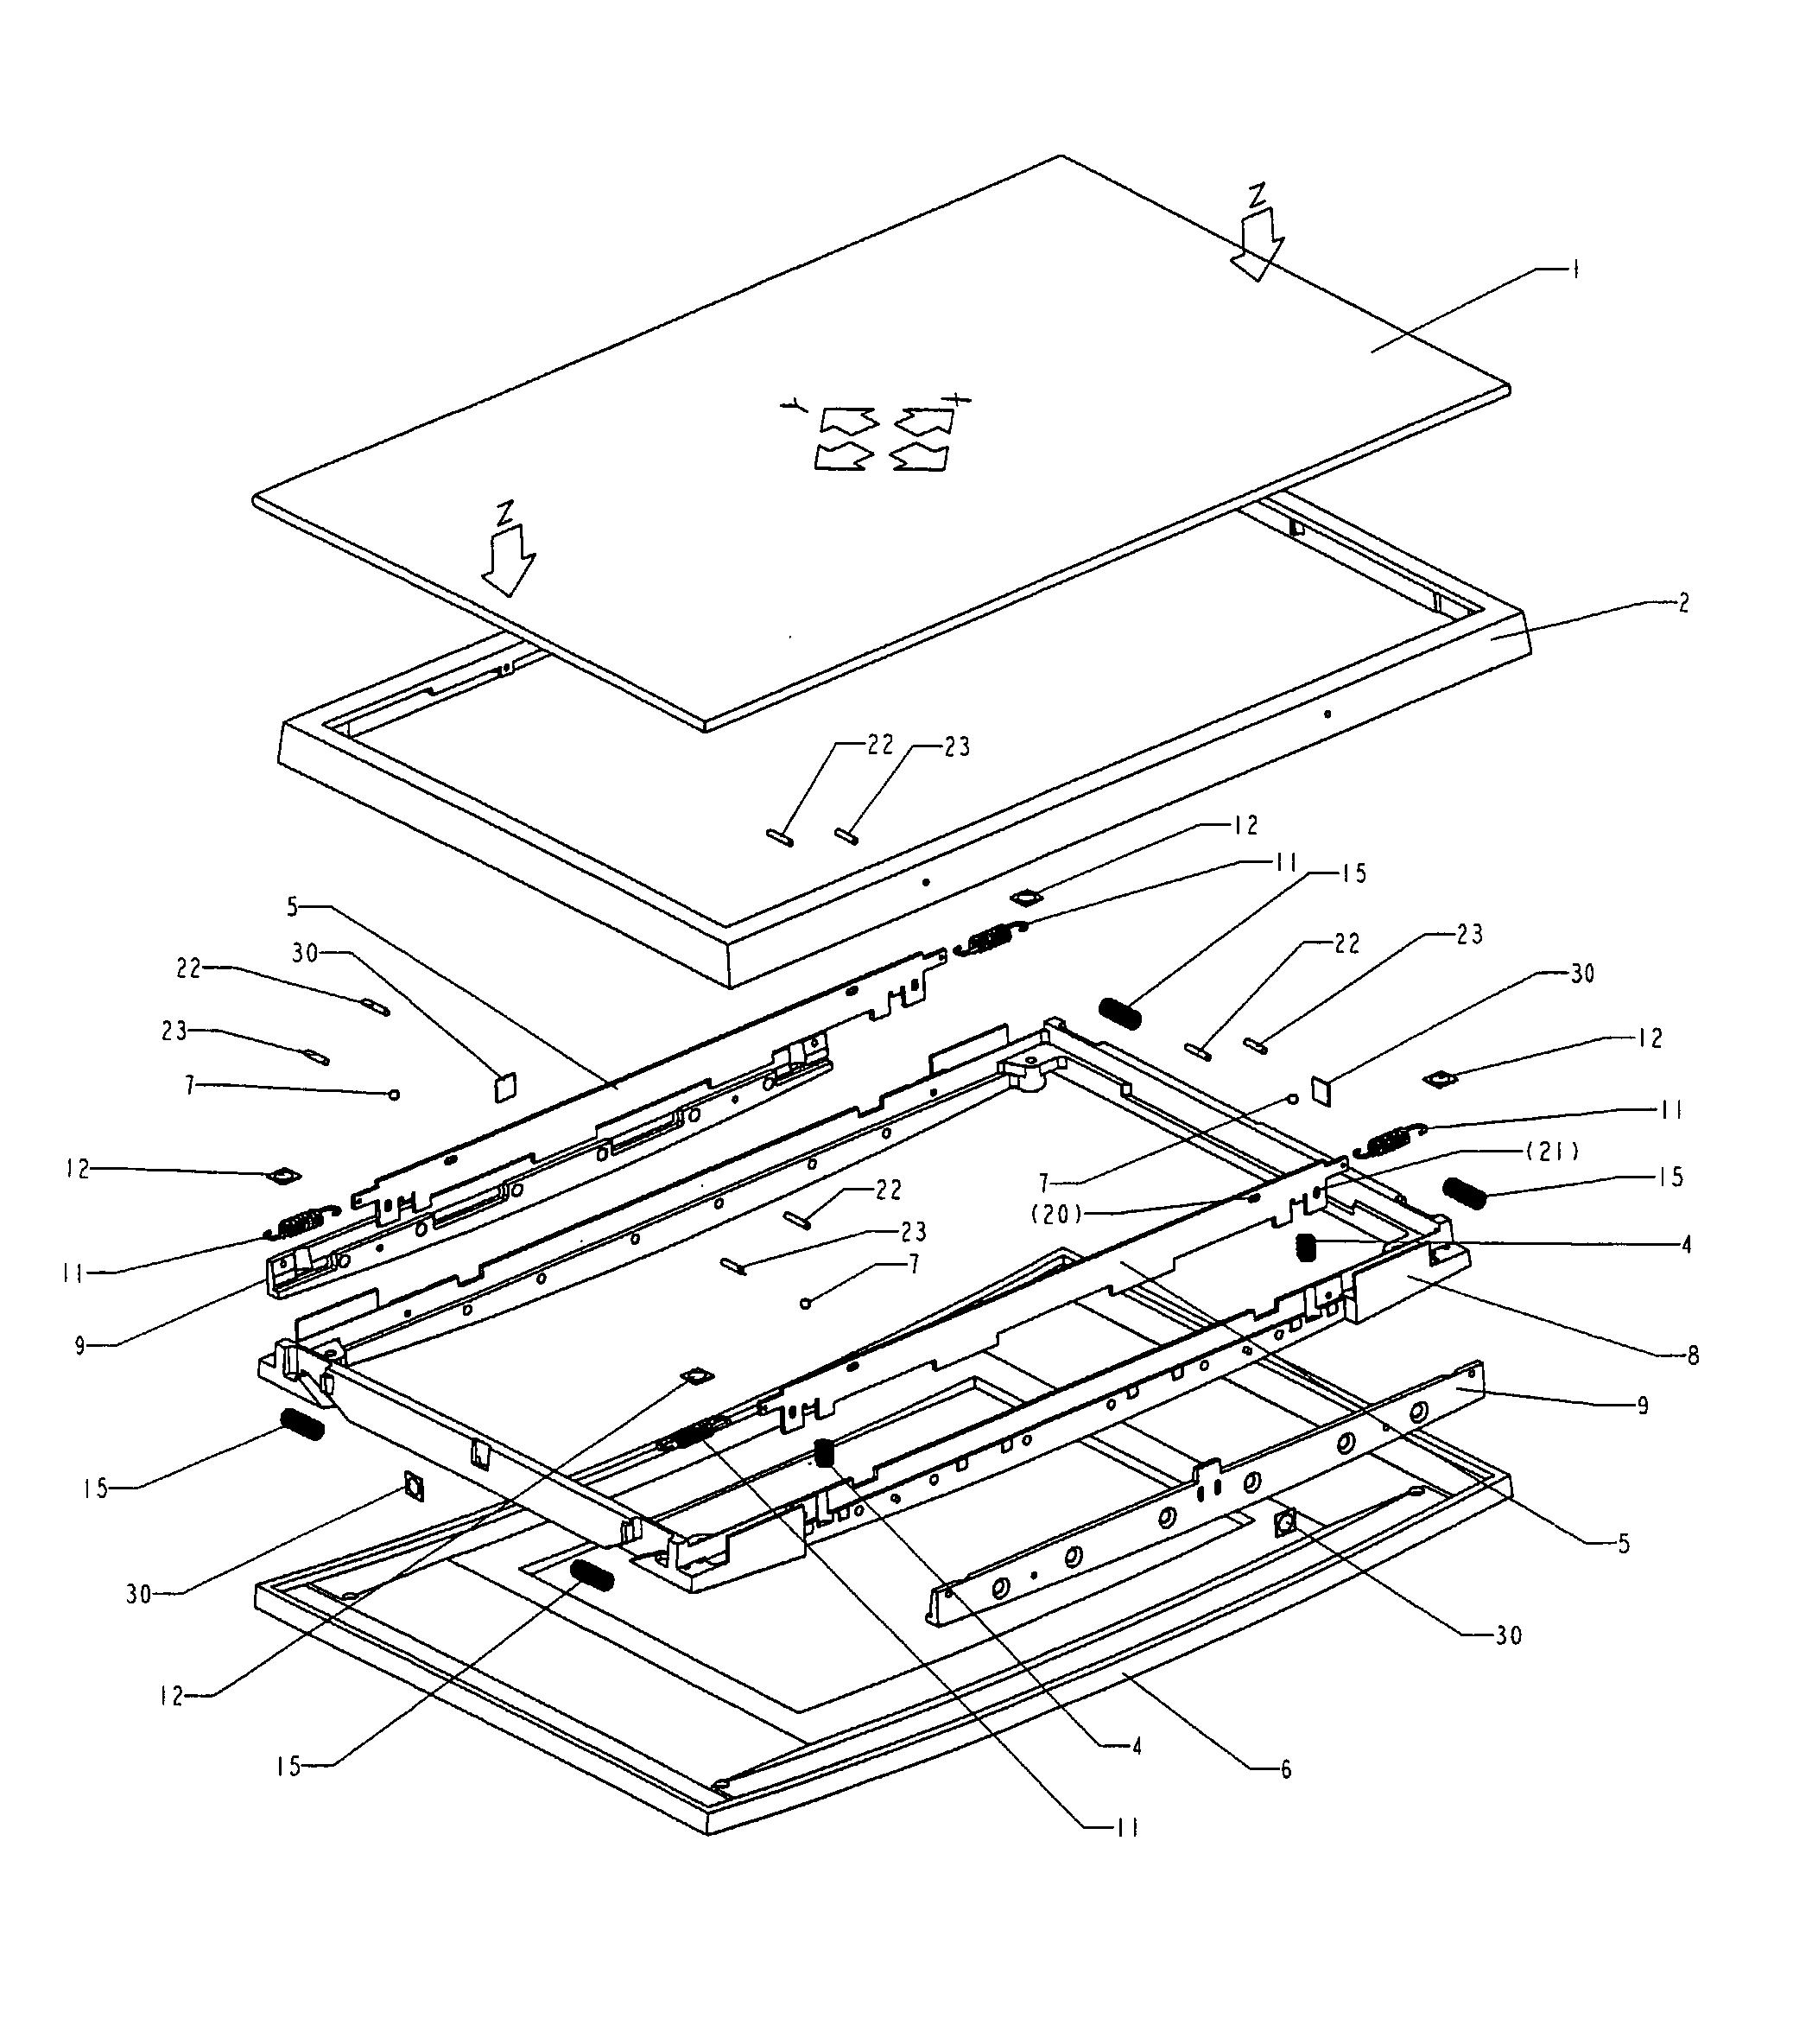 patent us7969411 - operating panel